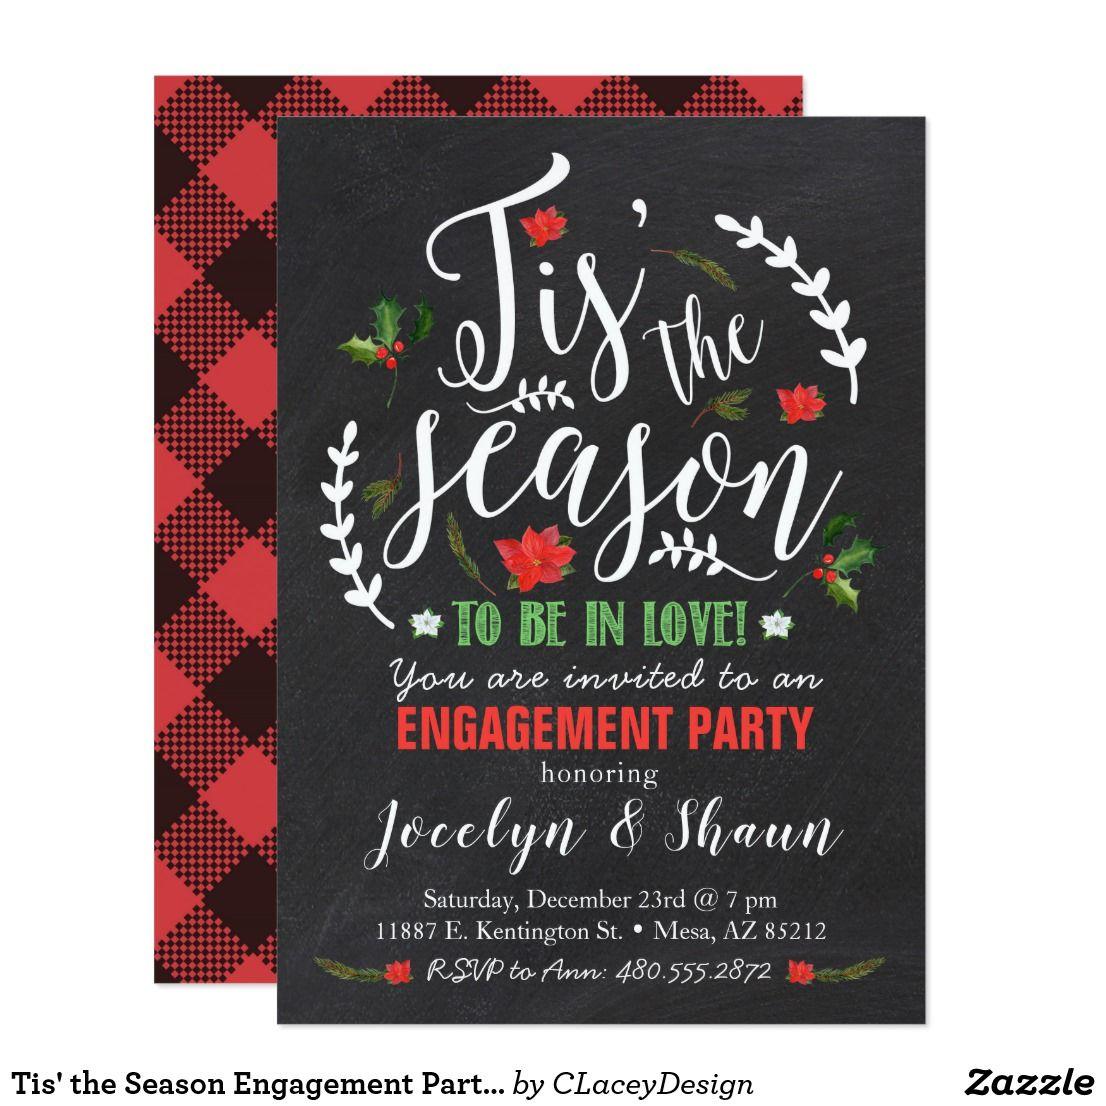 Tis\' the Season Engagement Party Invitation | Pinterest | Engagement ...